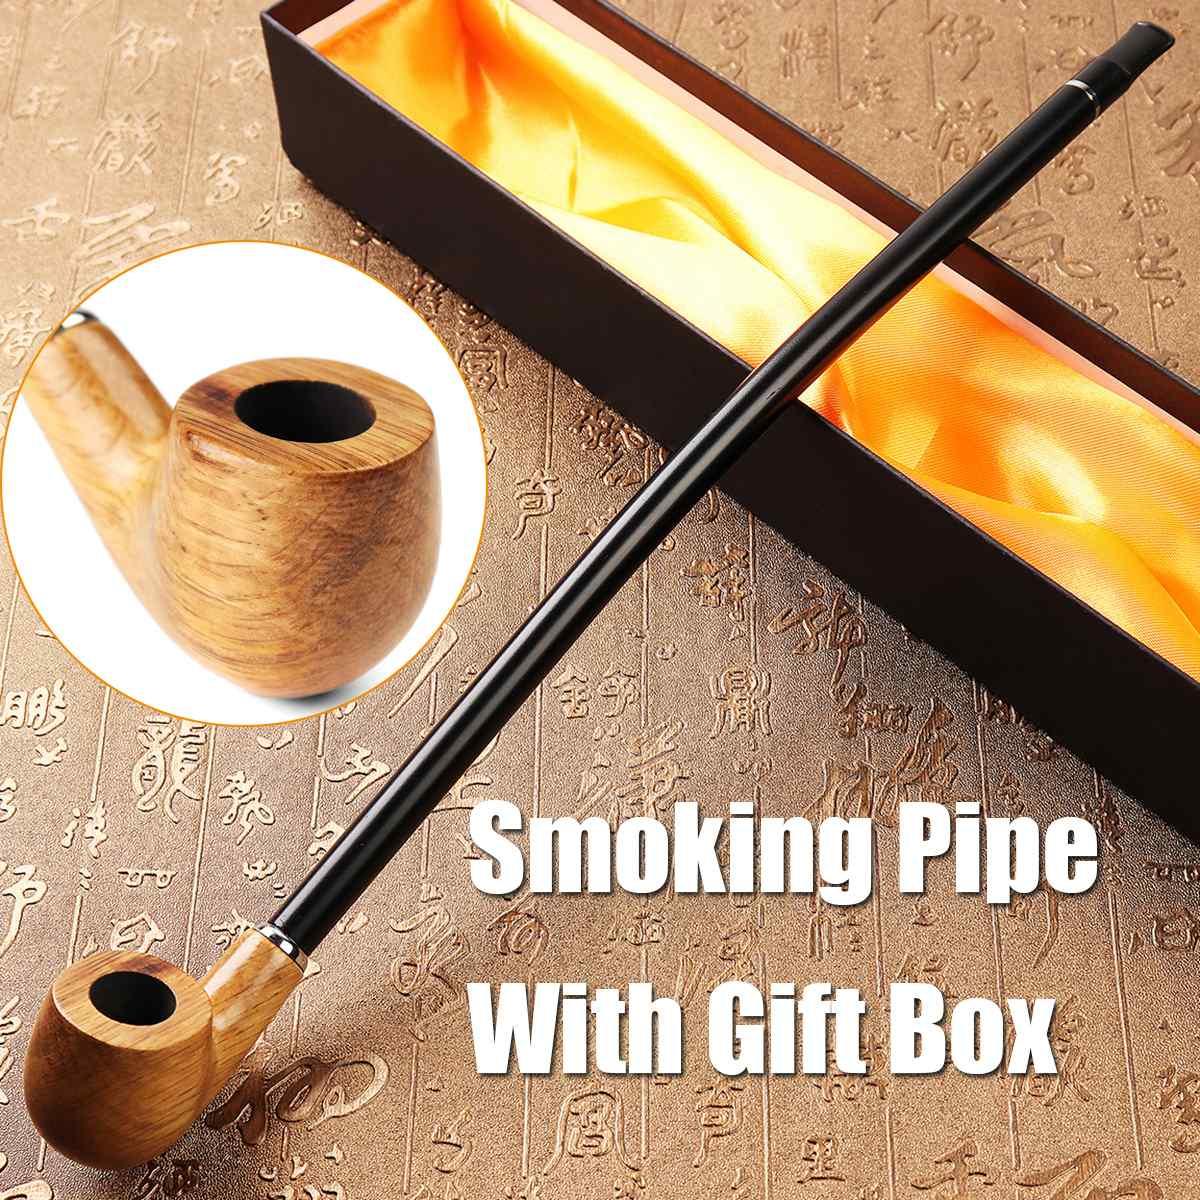 Pipa de fumar de madera de mango largo Pipa de madera sólido pipa de fumar tabaco con hermosa caja de regalo accesorios de cigarrillos